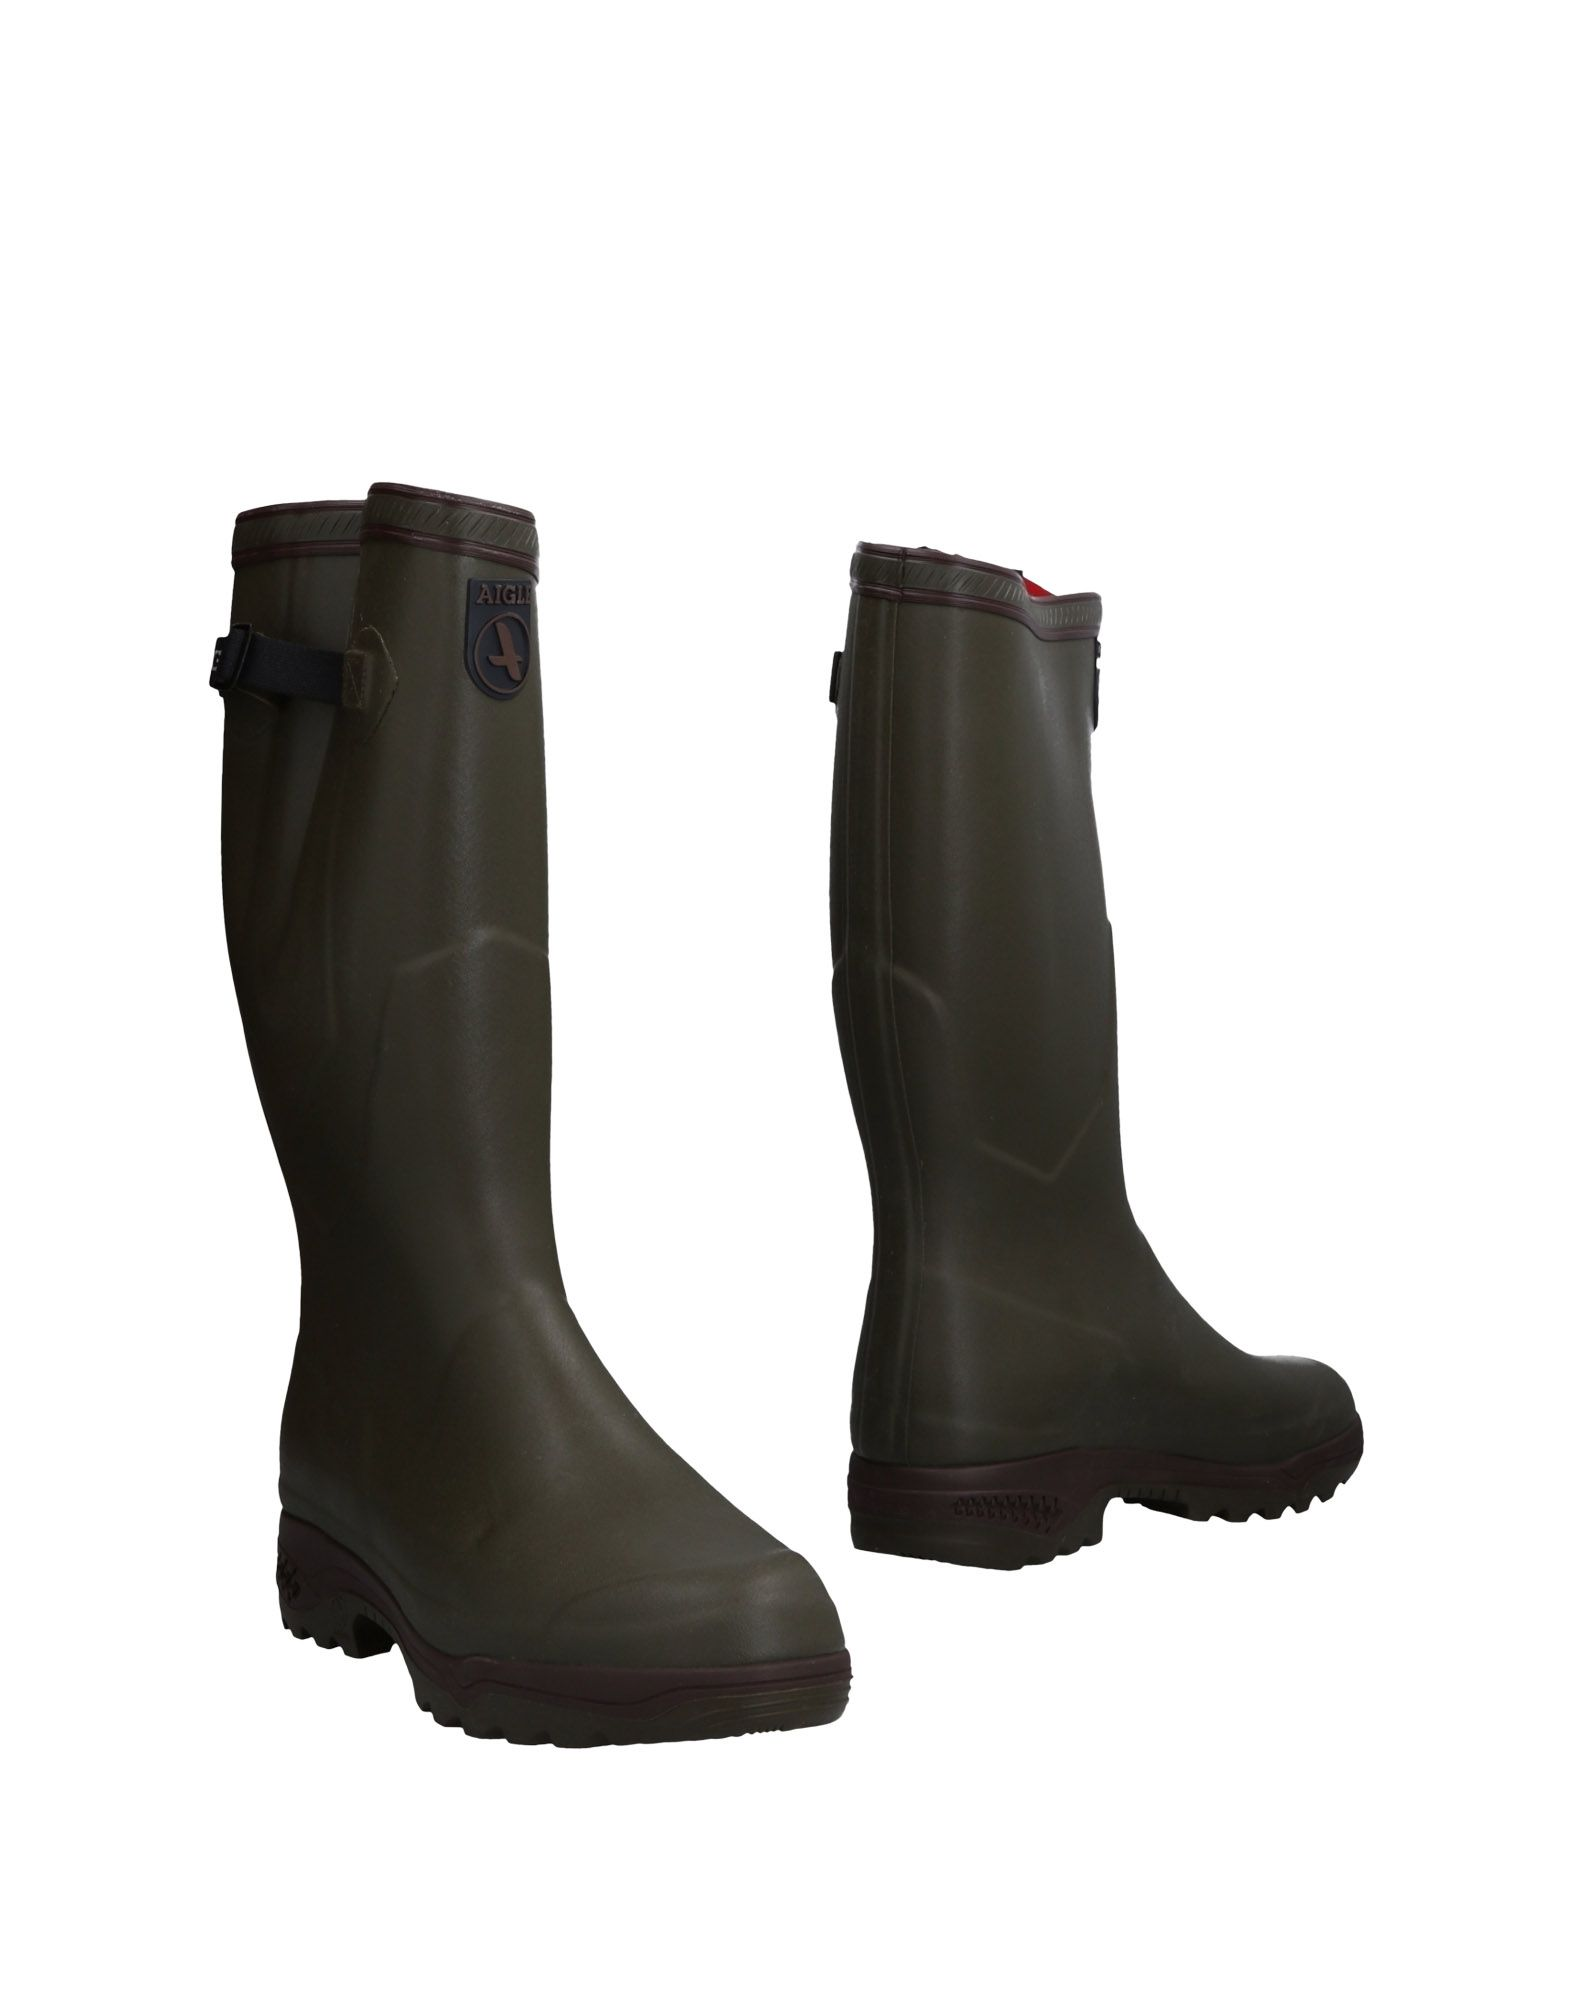 Rabatt echte Schuhe Aigle Stiefelette 11477541RL Herren  11477541RL Stiefelette 5e8c78